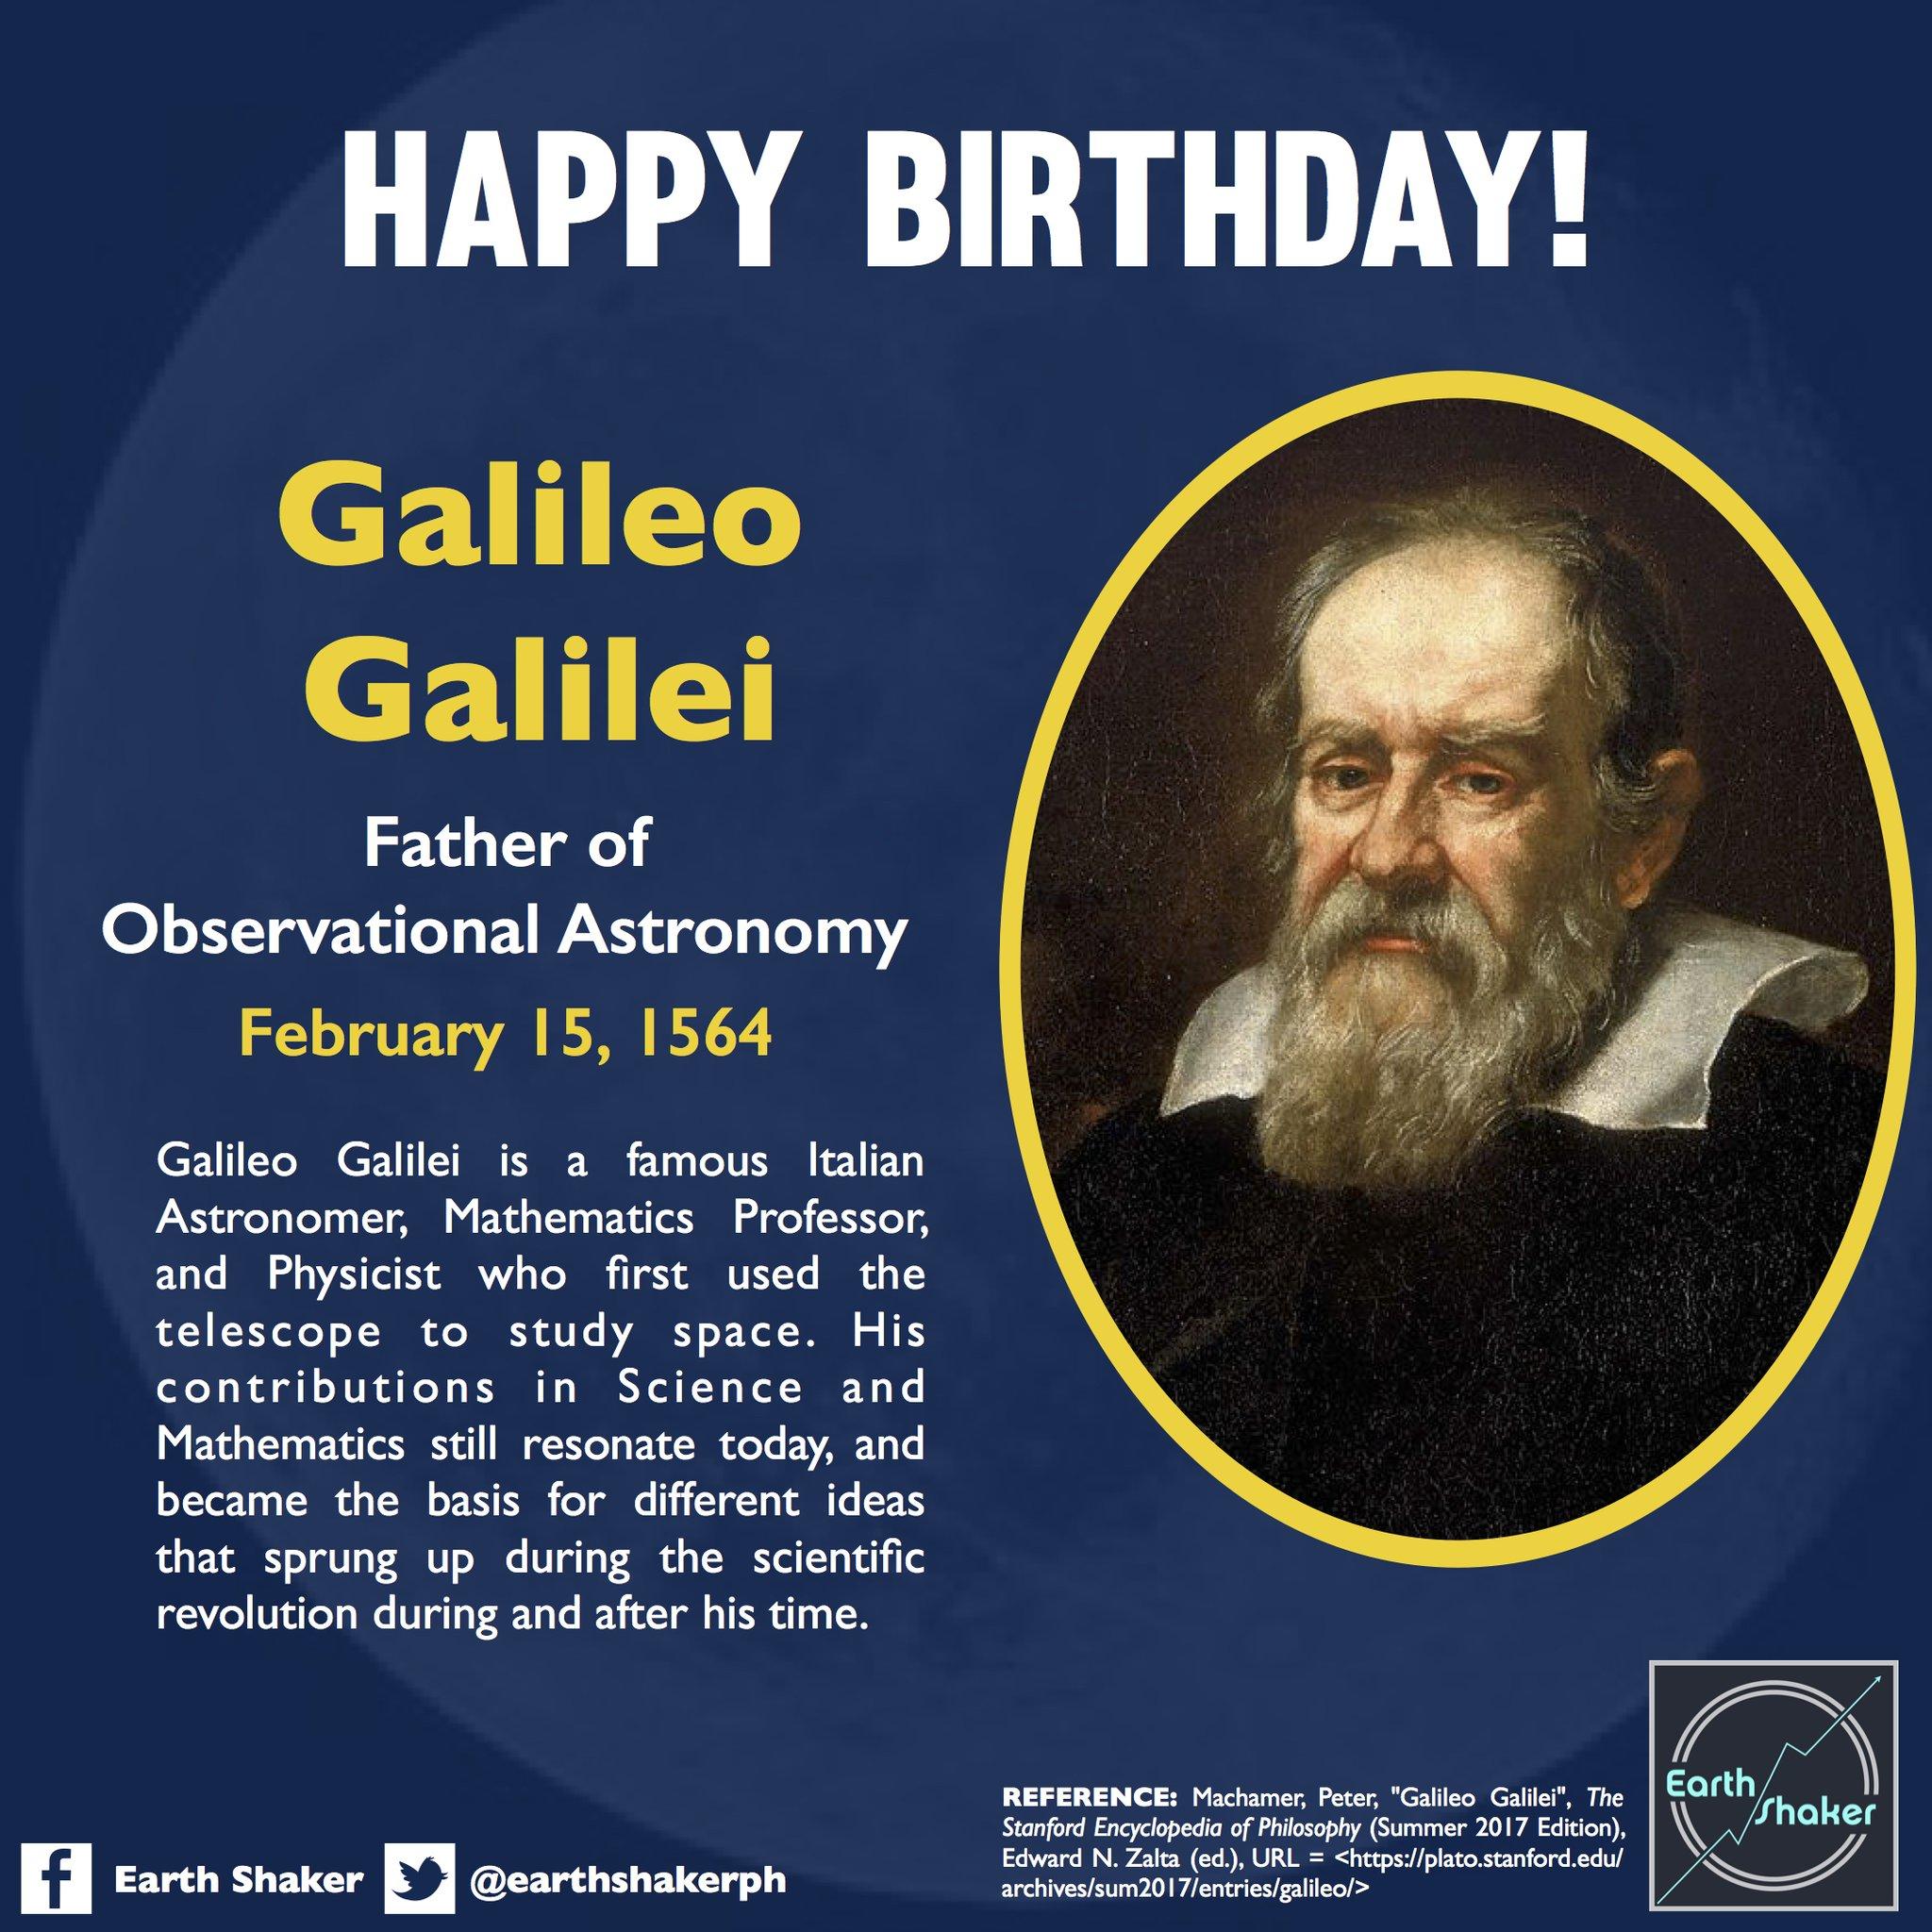 "Earth Shaker PH on Twitter: ""Galileooooooo, Galileoooooo! On this day in  1564, the famous Italian astronomer, Galileo Galilei, was born in Pisa,  Italy. His initiative of using the telescope to observe the"